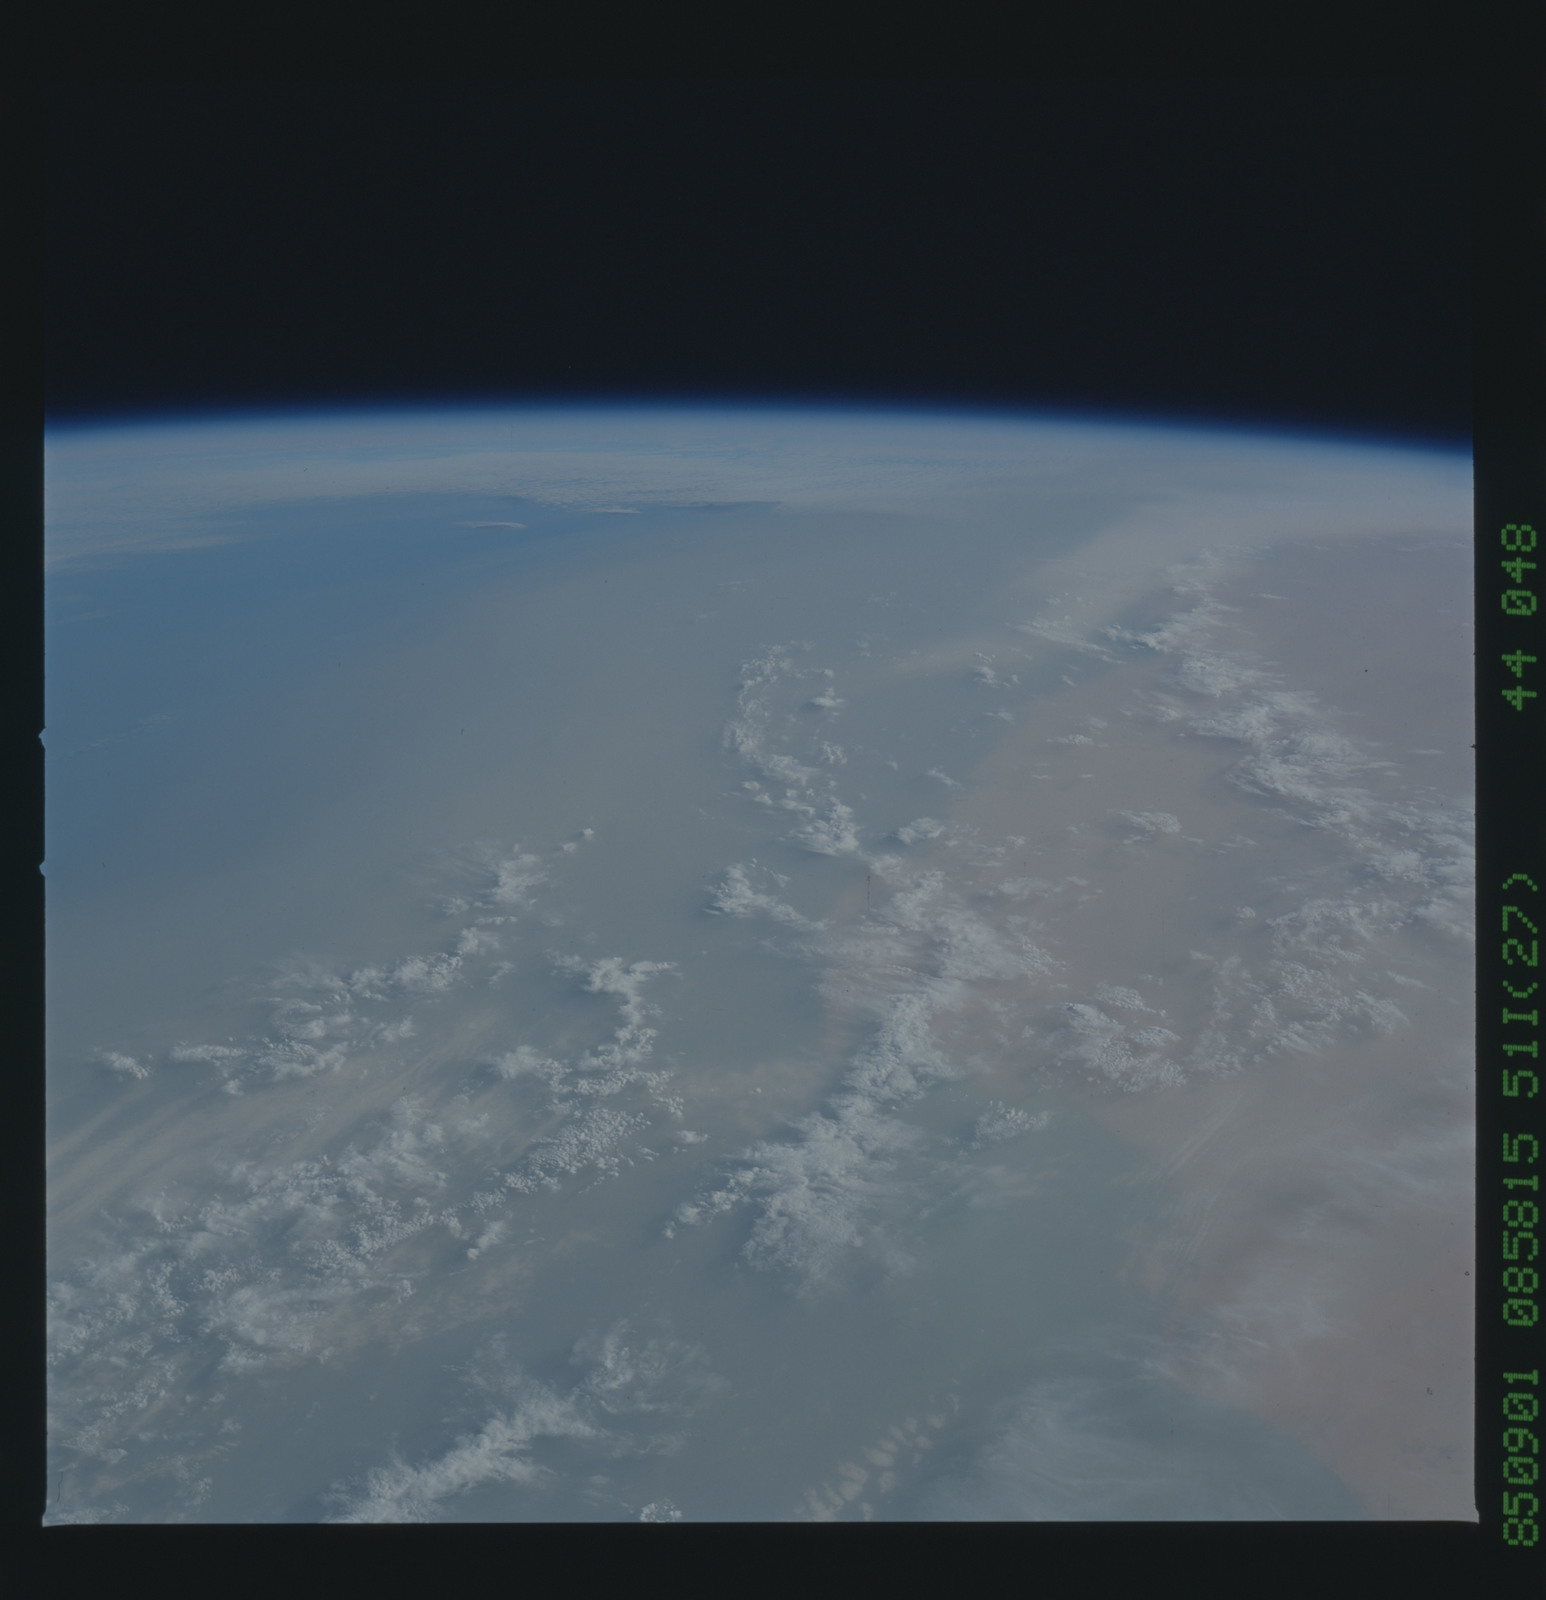 51I-44-048 - STS-51I - STS-51I earth observations